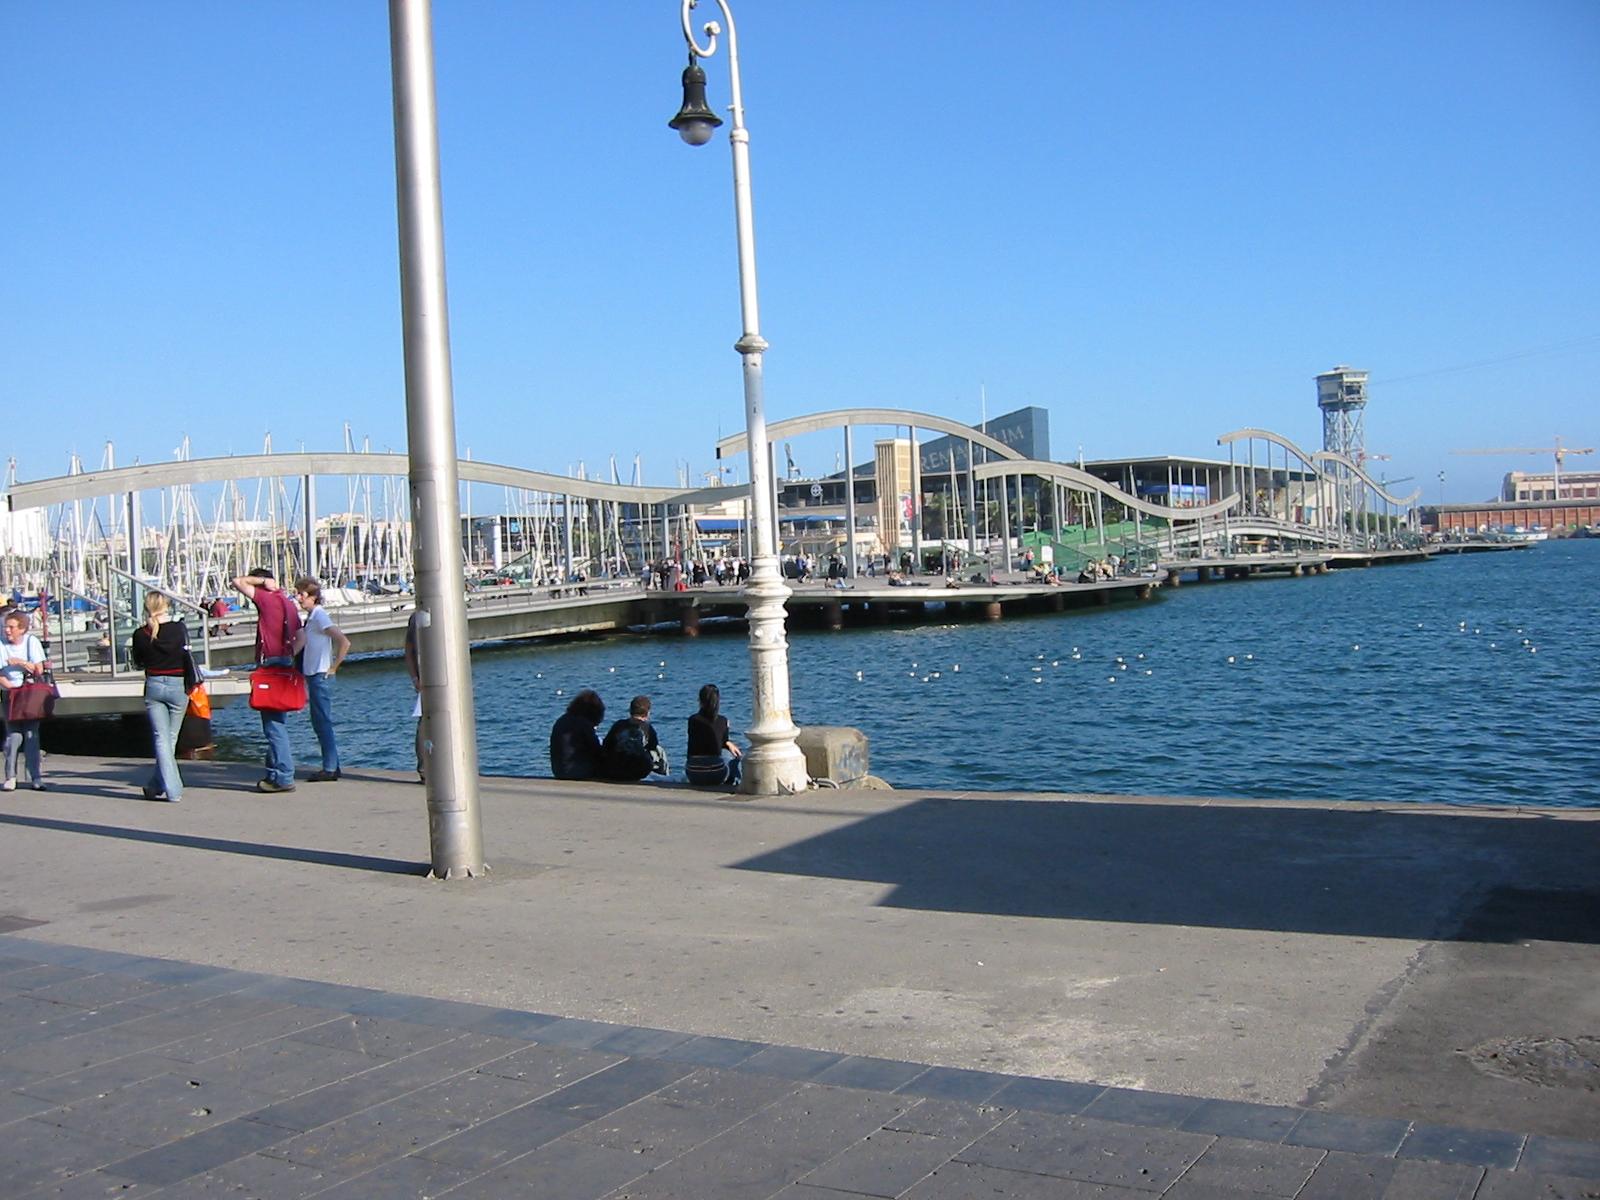 architecture exteriors cityscapes barca bareclona marina bridge people tourists water sitting standing lamppost